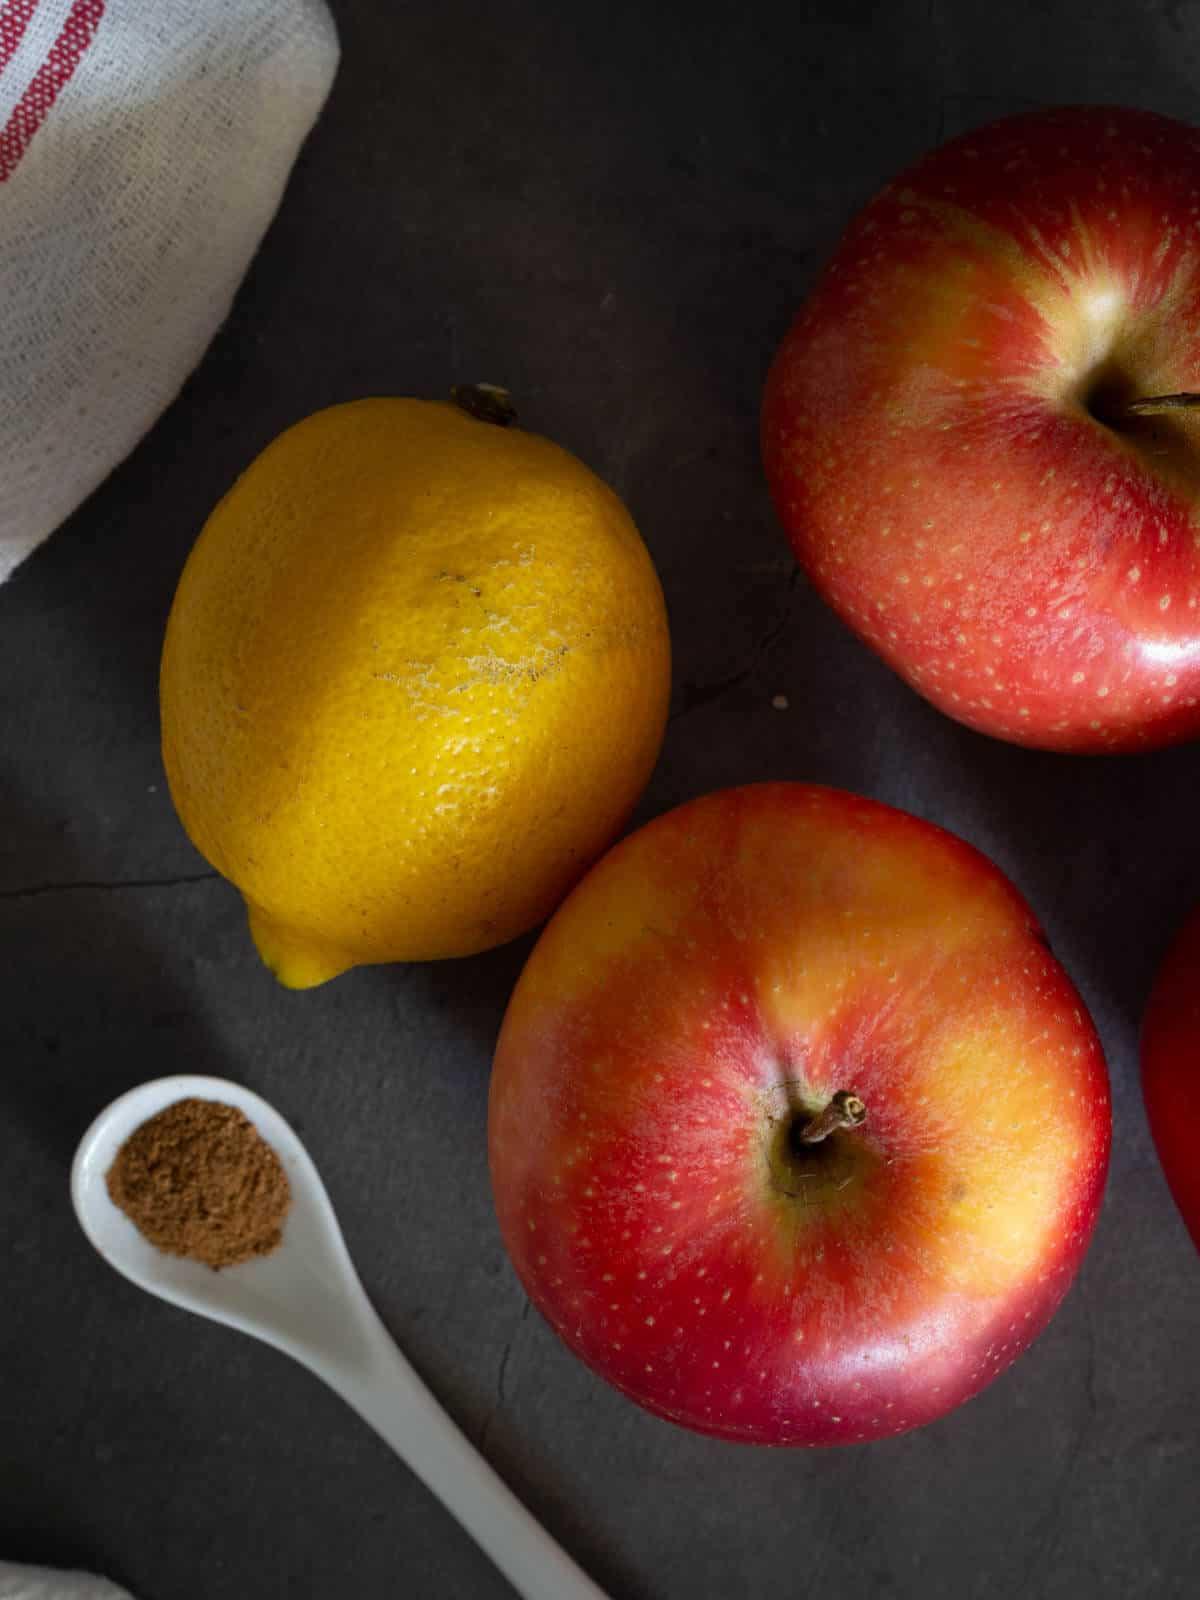 Unsweetened applesauce